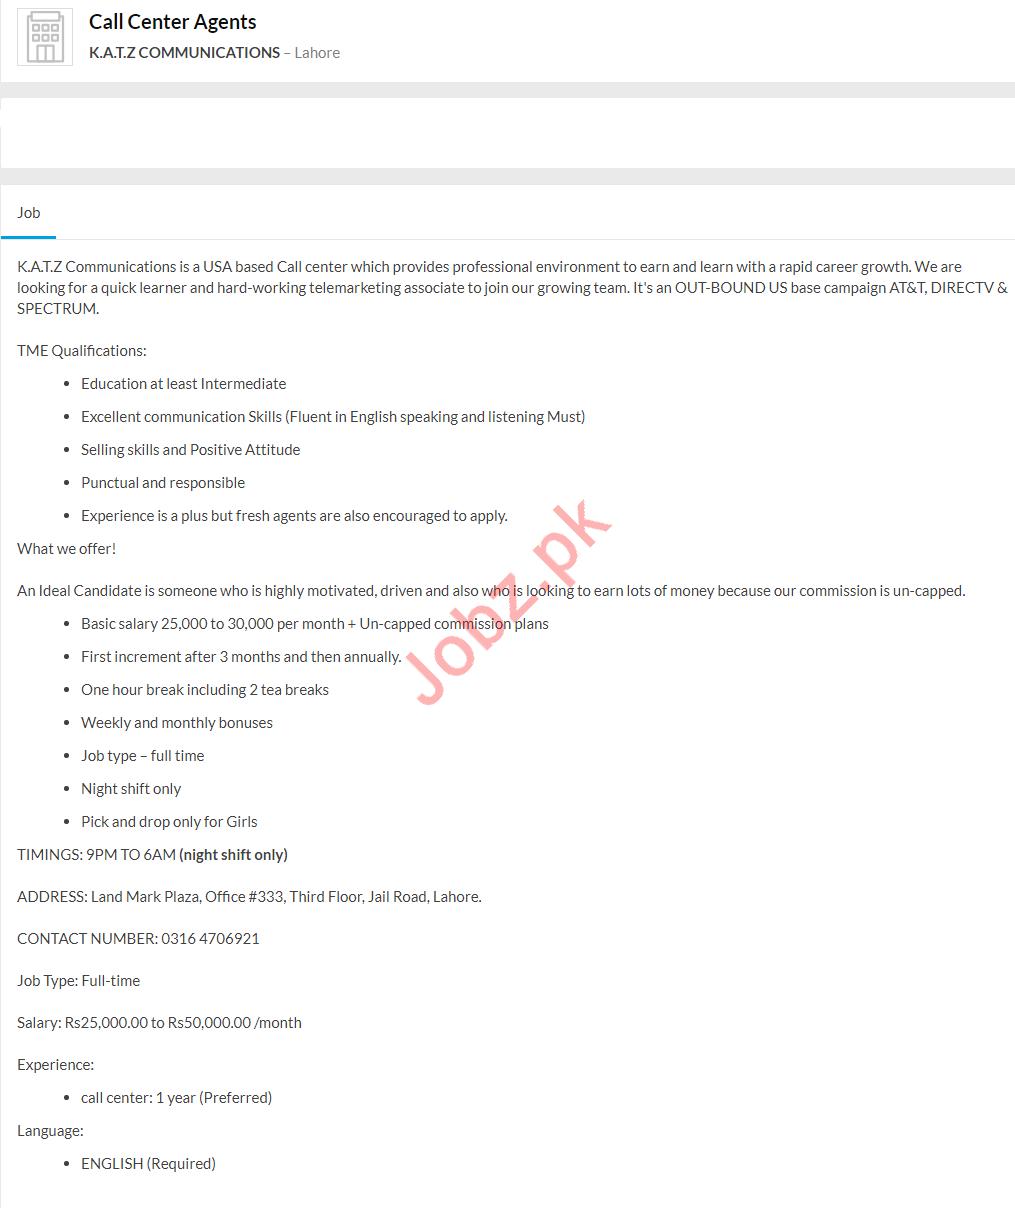 KATZ Communications Jobs 2020 For Call Center Agents